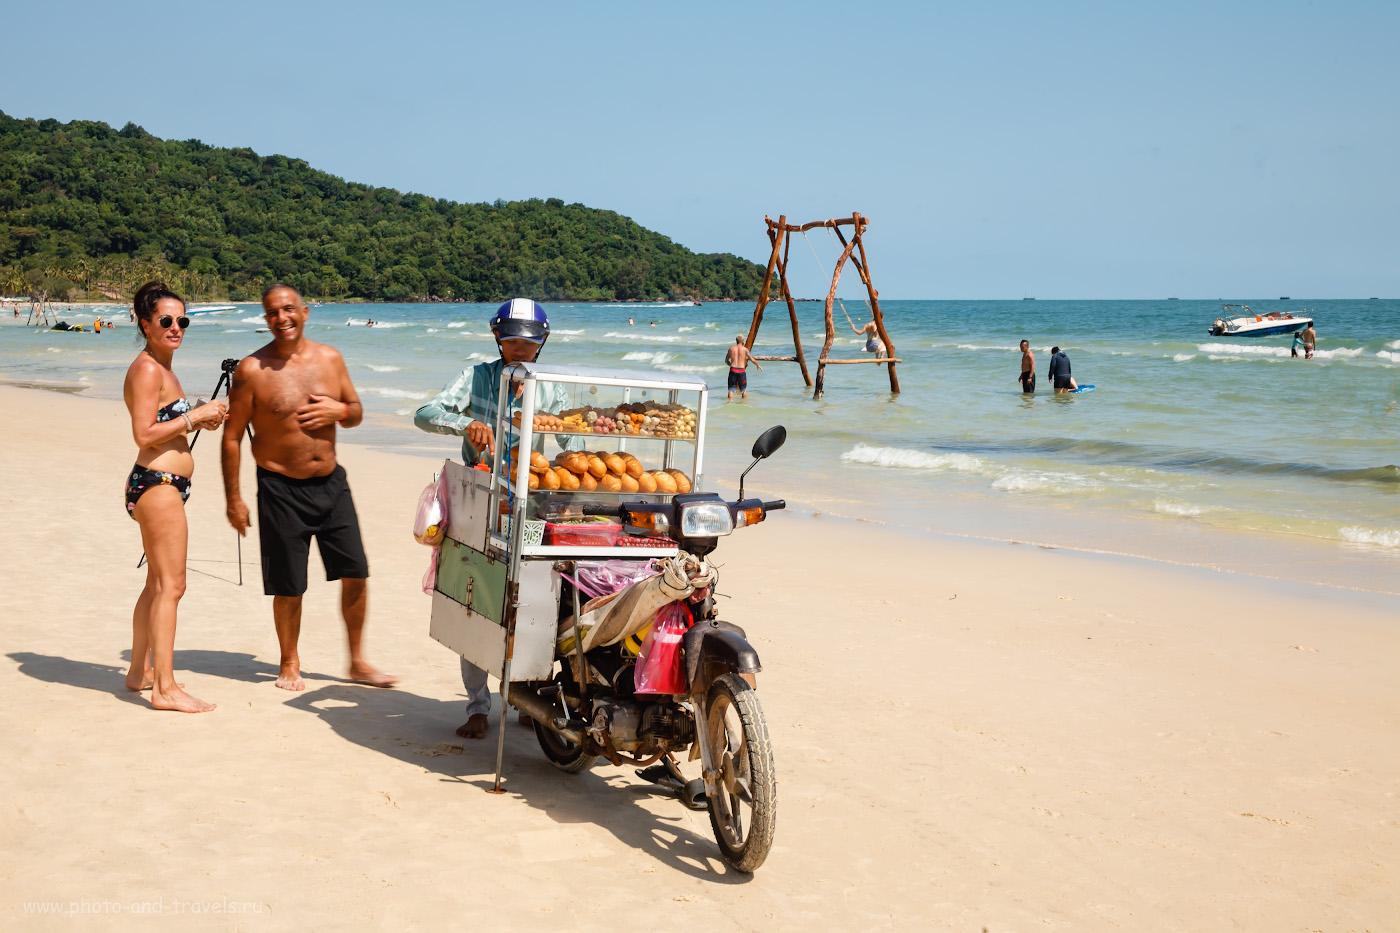 34. Продавец хот-догов БанМи на пляже. 1/60, 16.0, 100, 80.